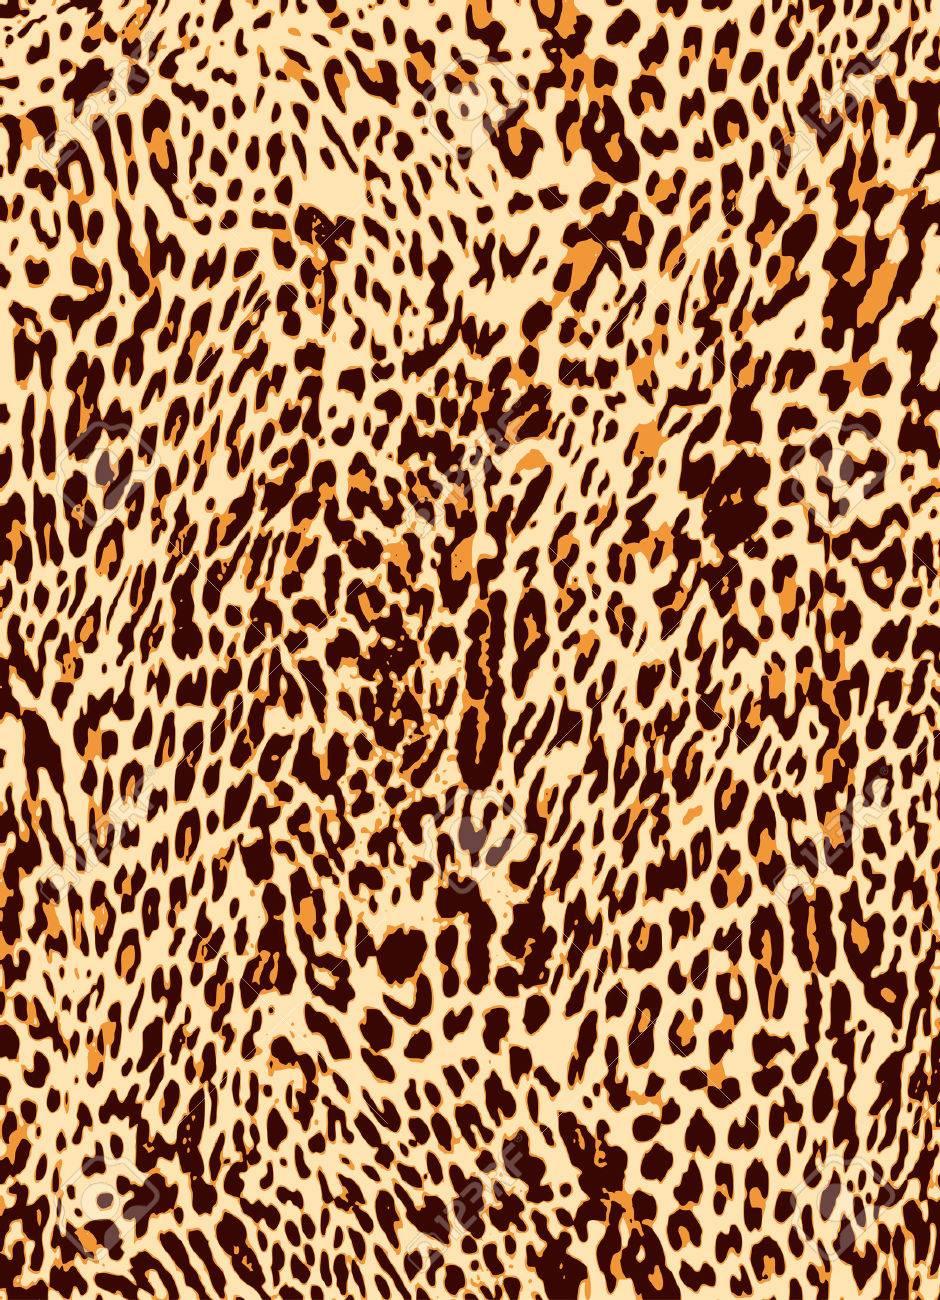 animal leopard skin texture print background Stock Vector - 9055486